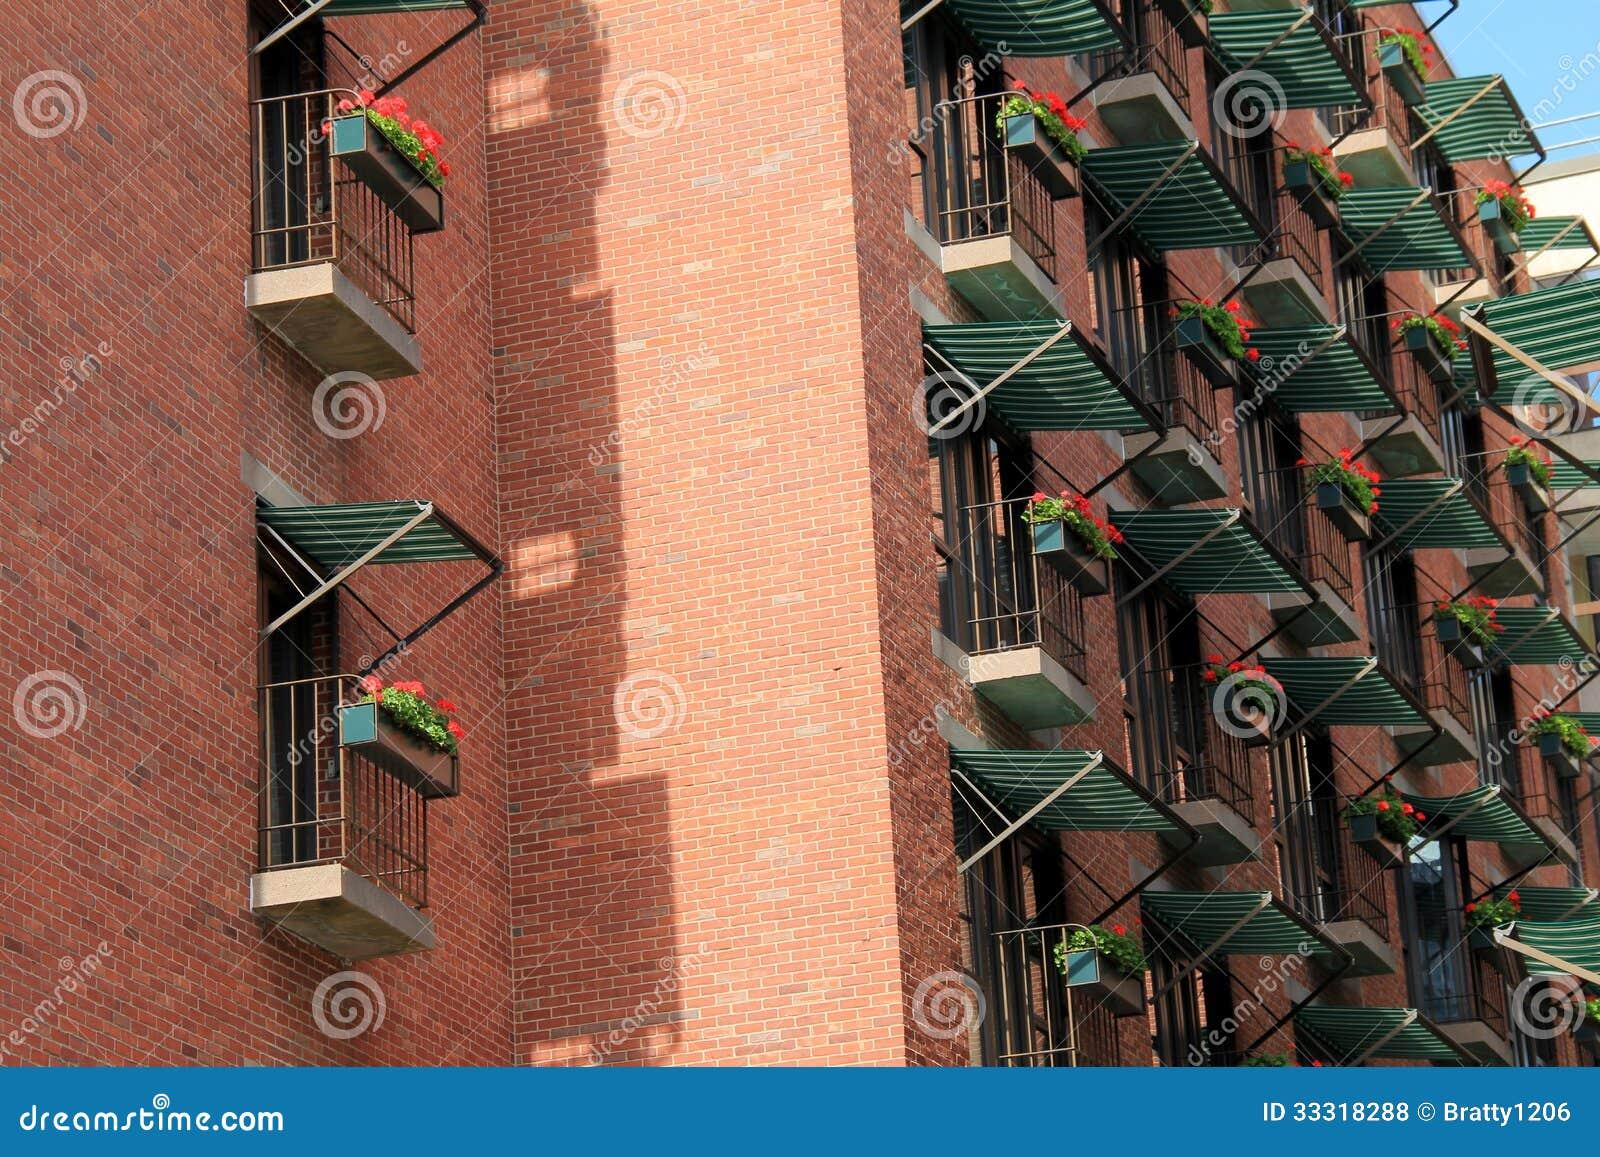 #0A7EC2 bonita de toldos listrados verdes e brancos sobre caixas de janela  1508 Toldos Para Janelas De Apartamentos